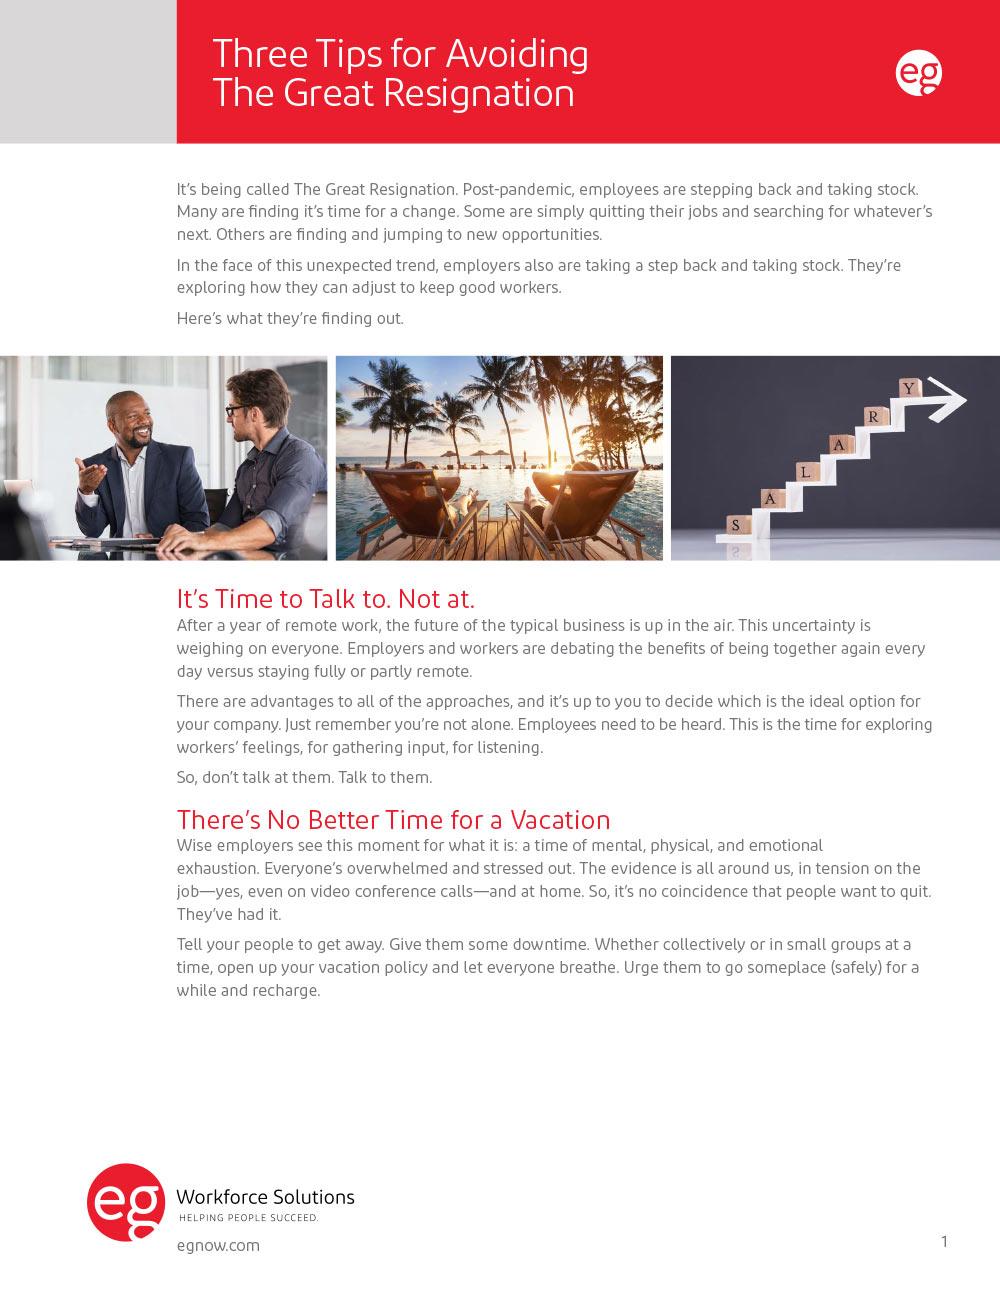 Three Tips for Avoiding The Great Resignation